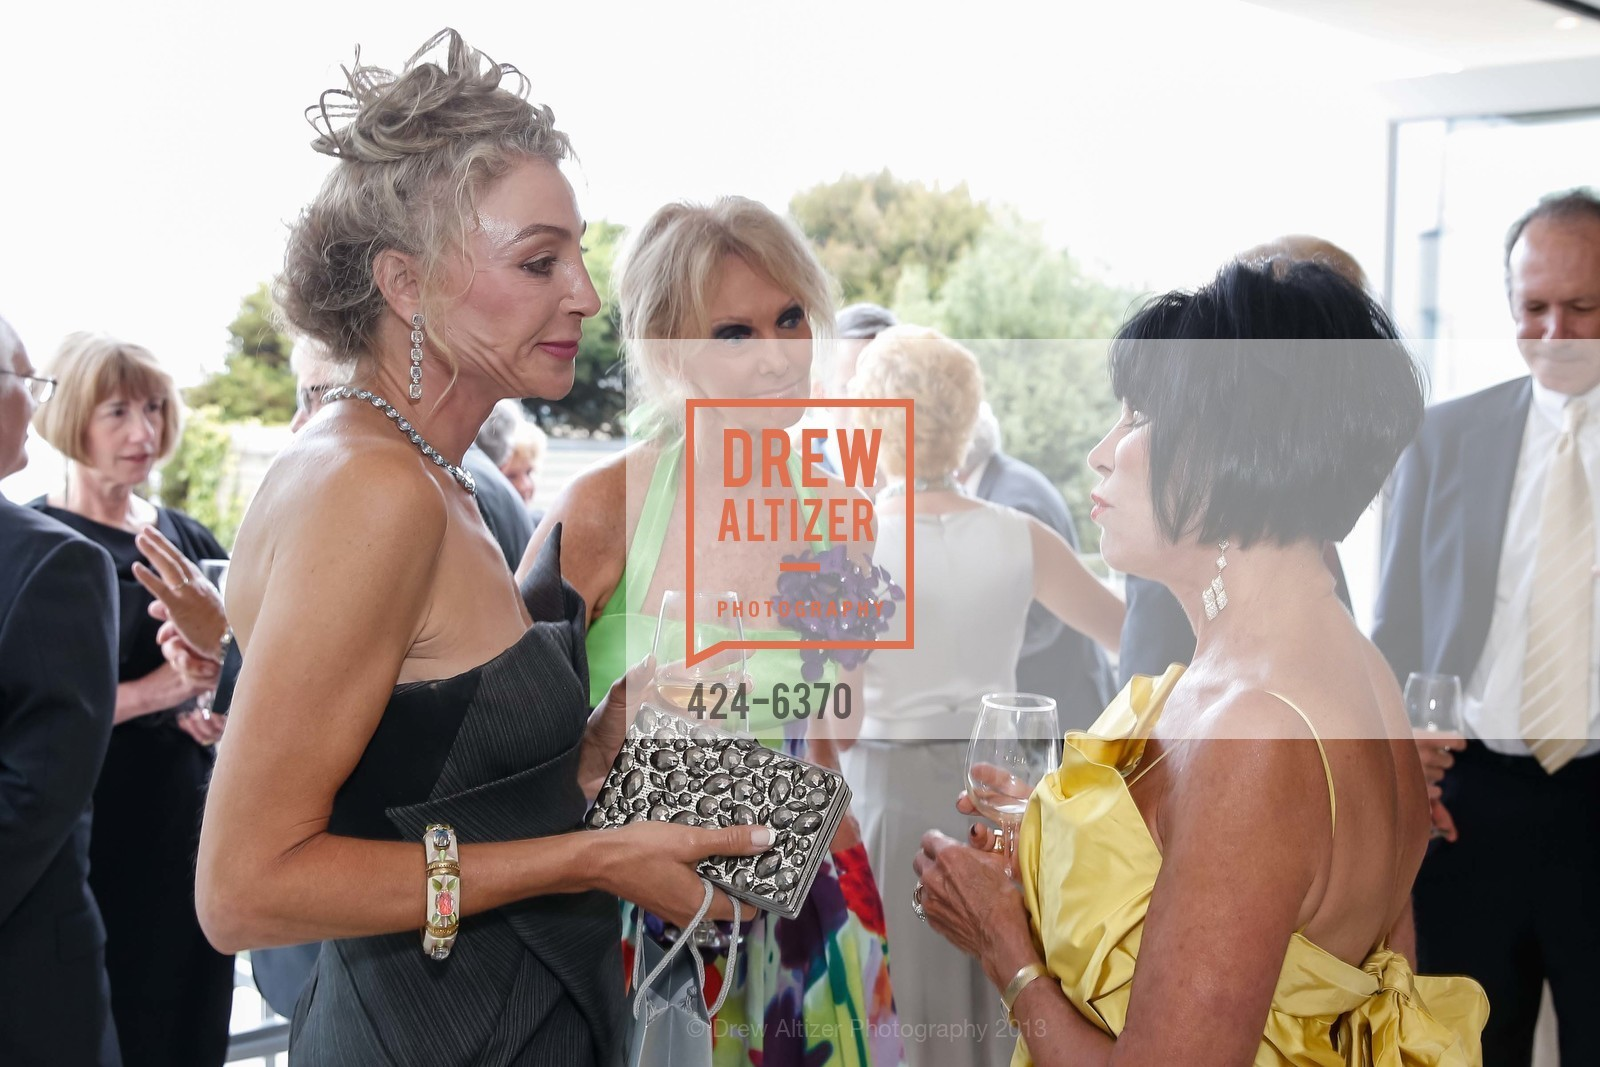 Alisa Burgess-Blajwas, Belinda Berry, Marilyn Cabak, OPERA GALA Patrons Party, US, August 28th, 2013